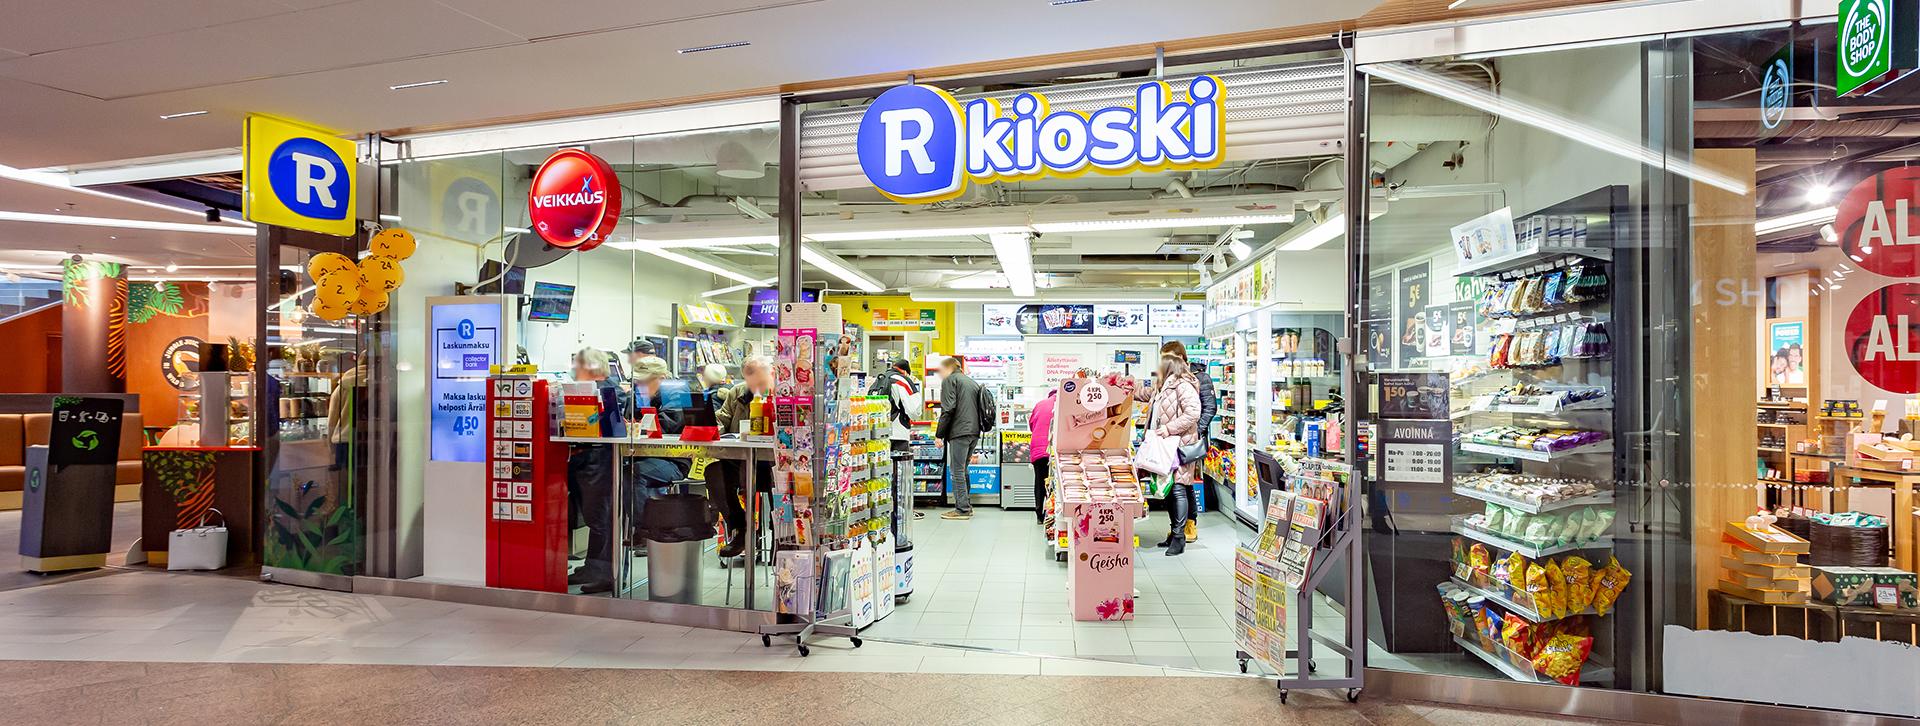 R Kioski Kivistö